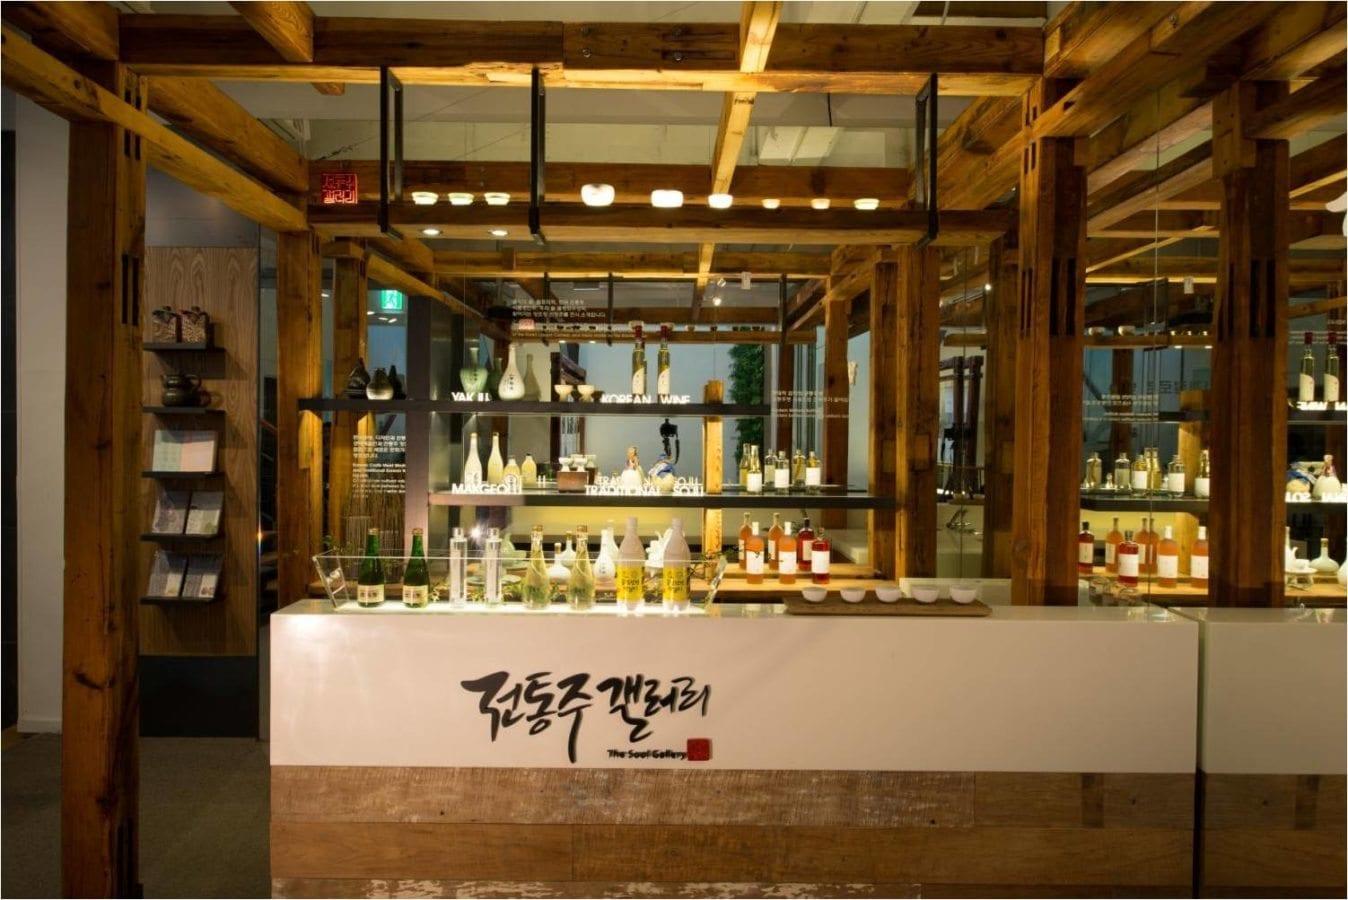 soju history museum soul gallery